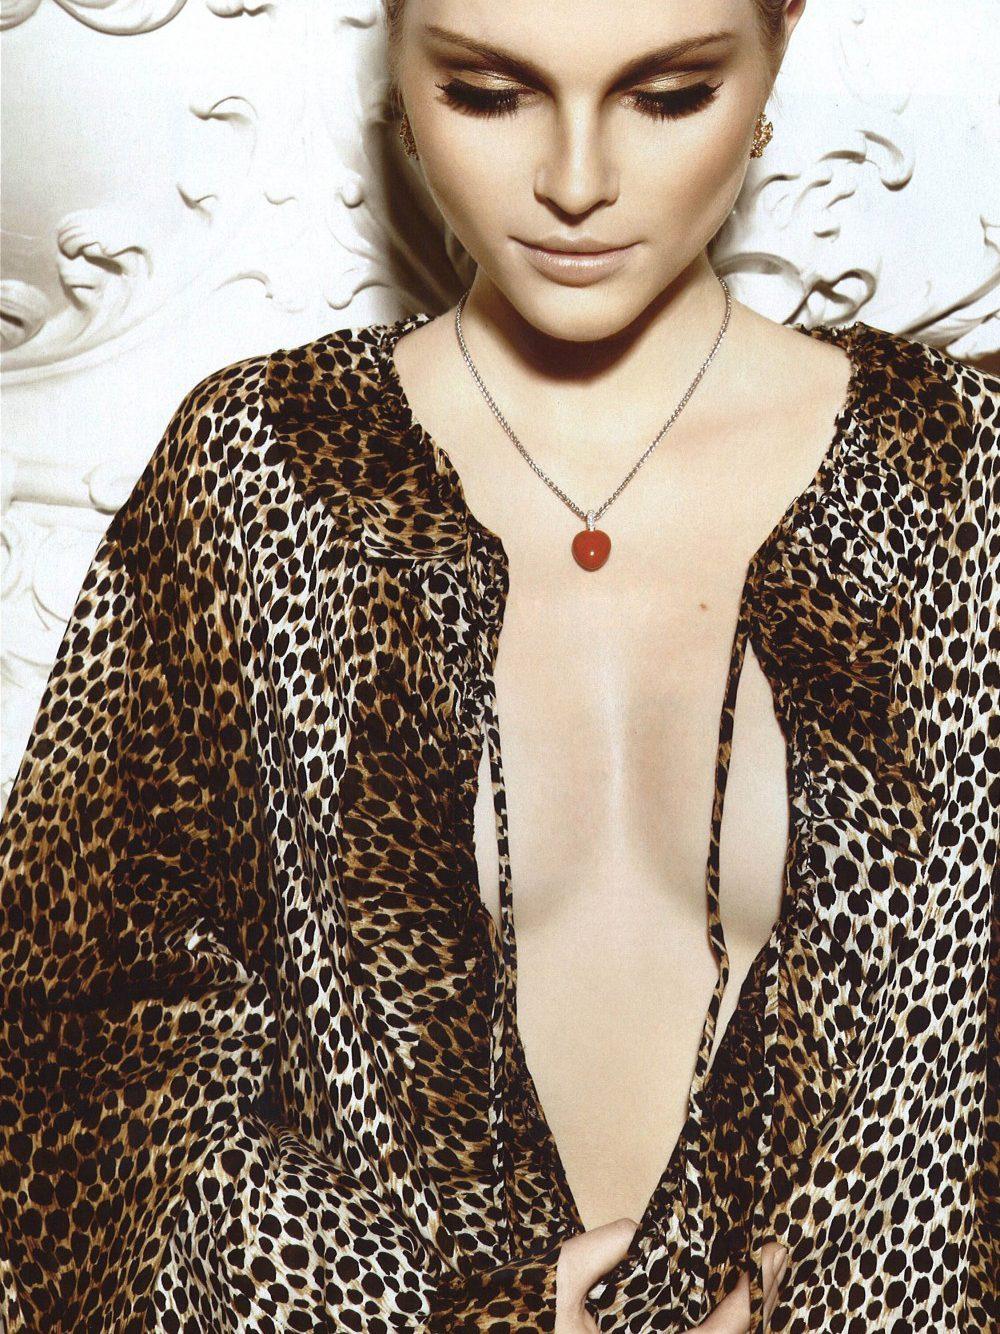 Monika Rohanova nudes (94 photo) Pussy, iCloud, panties